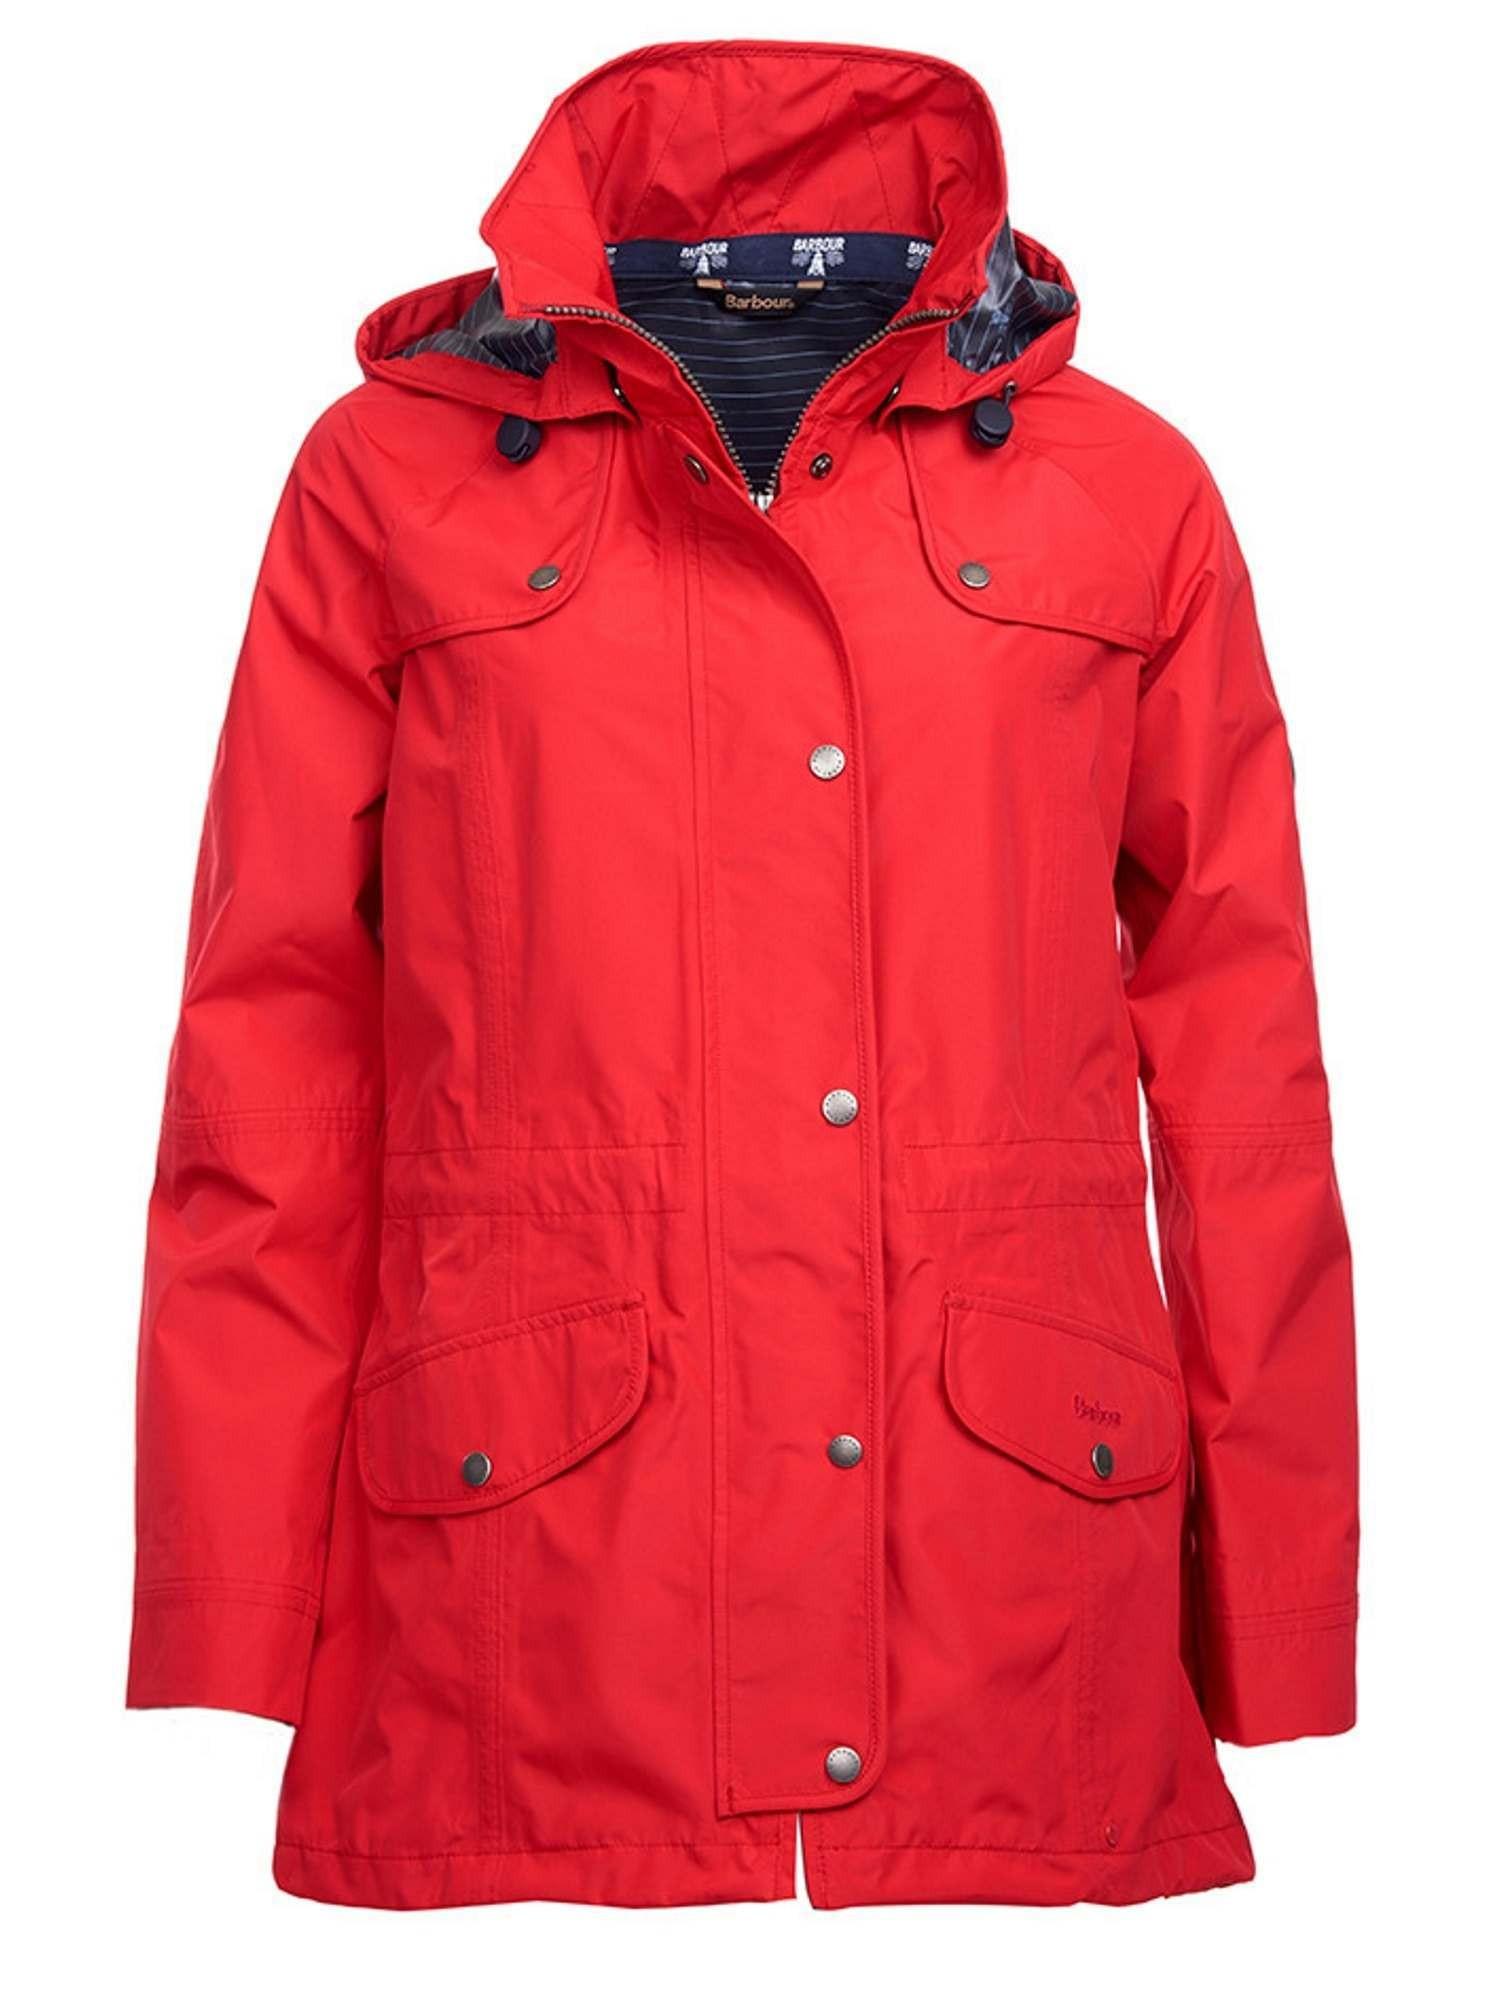 Red Jacket Clothing